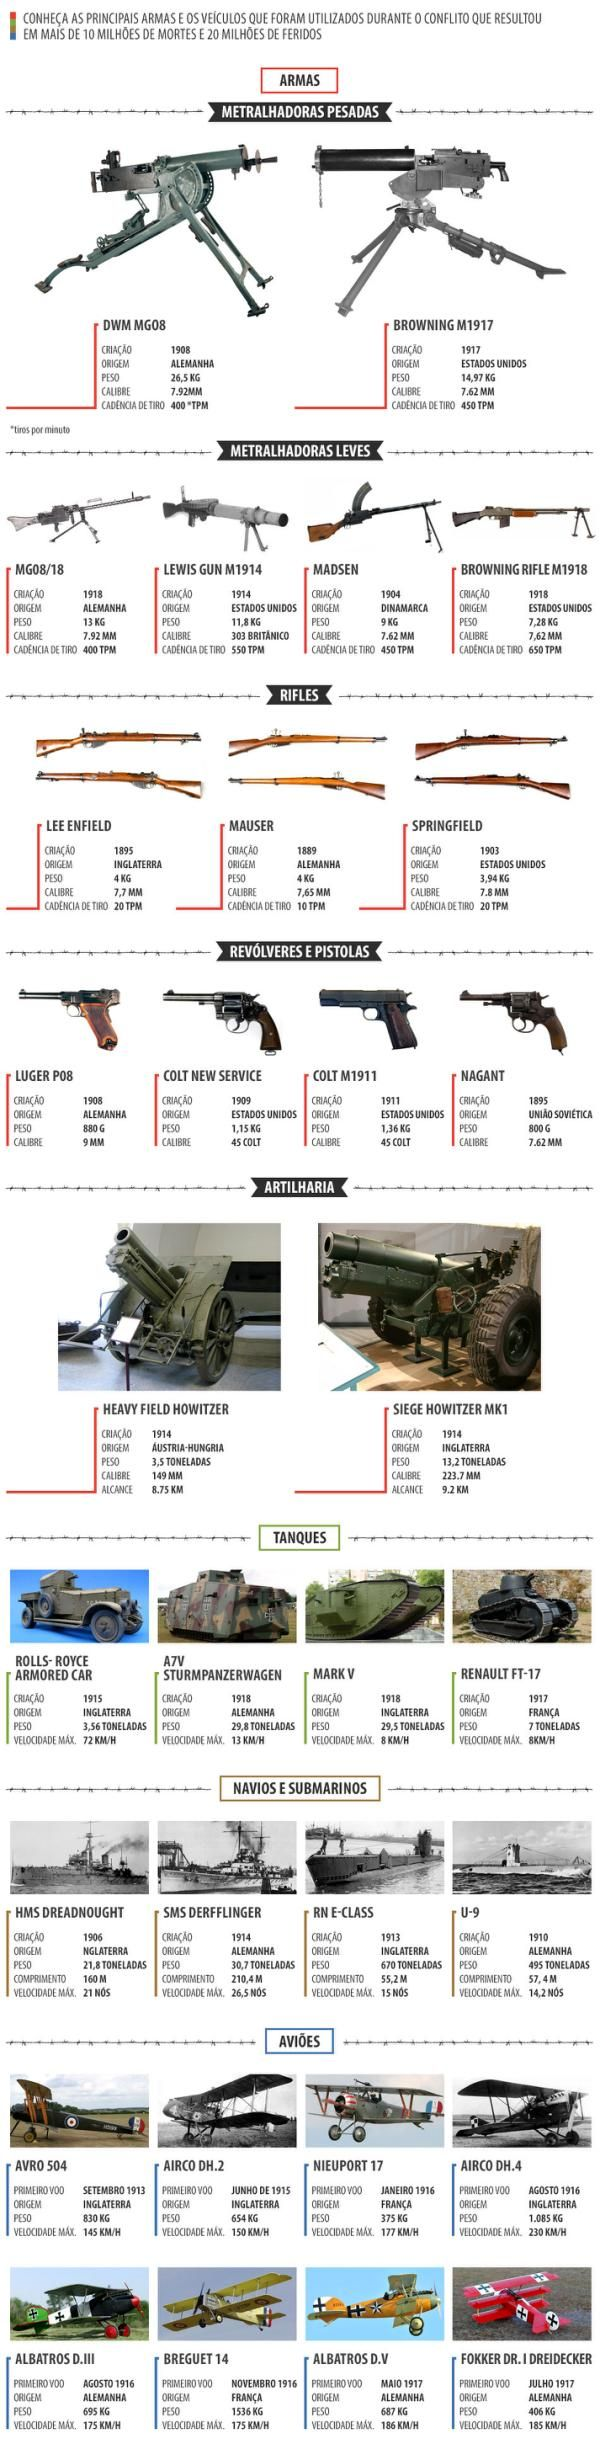 Relembre as armas utilizadas na Primeira Guerra Mundial